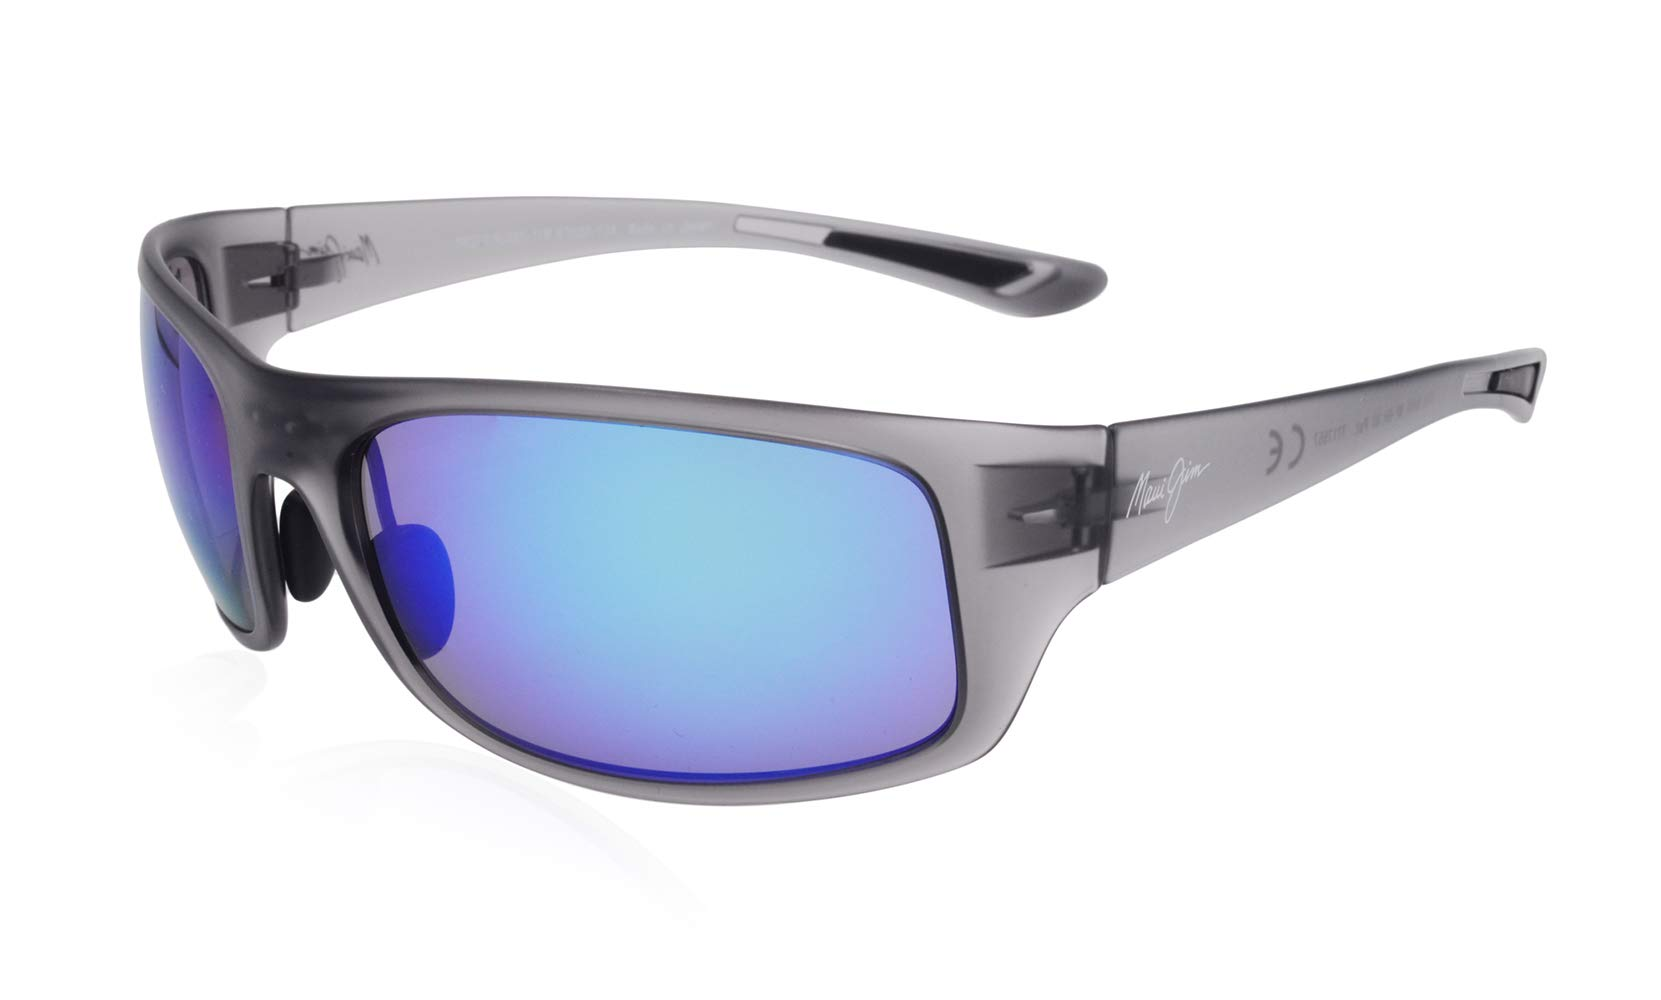 Maui Jim Sunglasses | Men's | Big Wave B440-11M | Translucent Matte Grey Wrap Frame, Polarized Blue Hawaii Lenses, with Patented PolarizedPlus2 Lens Technology by Maui Jim